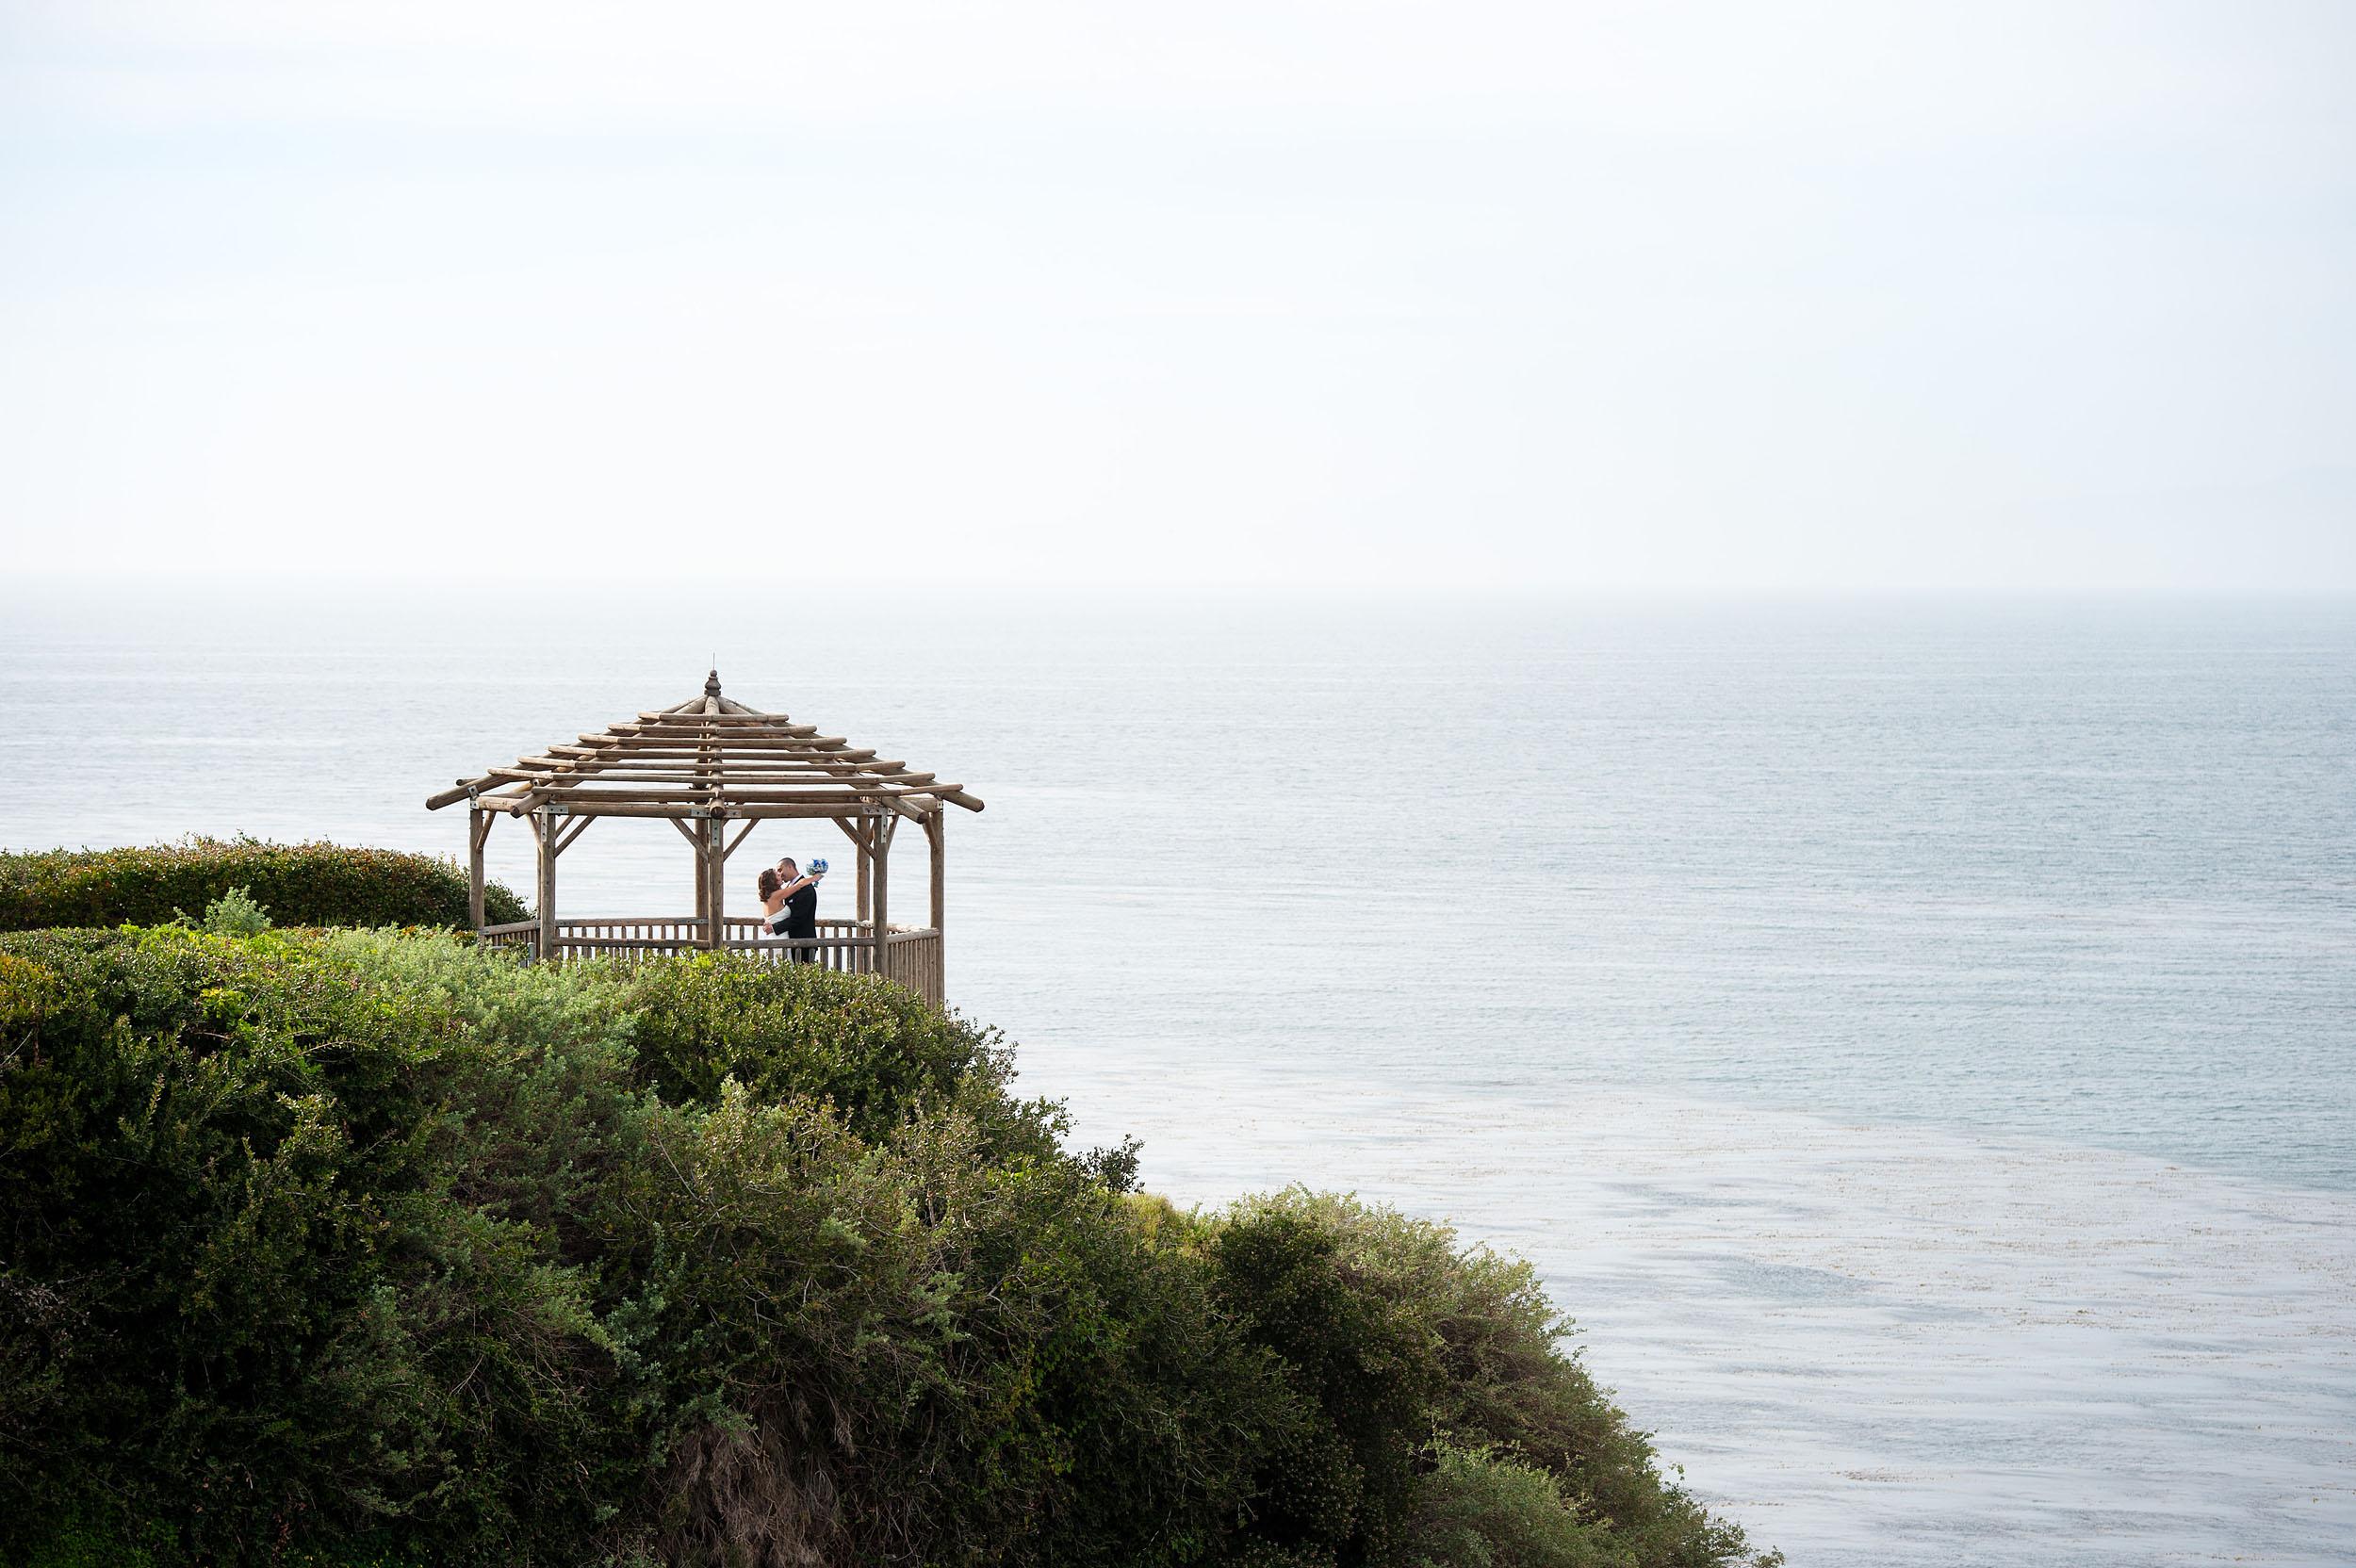 Bride and groom at gazebo in the Rancho Palos Verdes Peninsula.